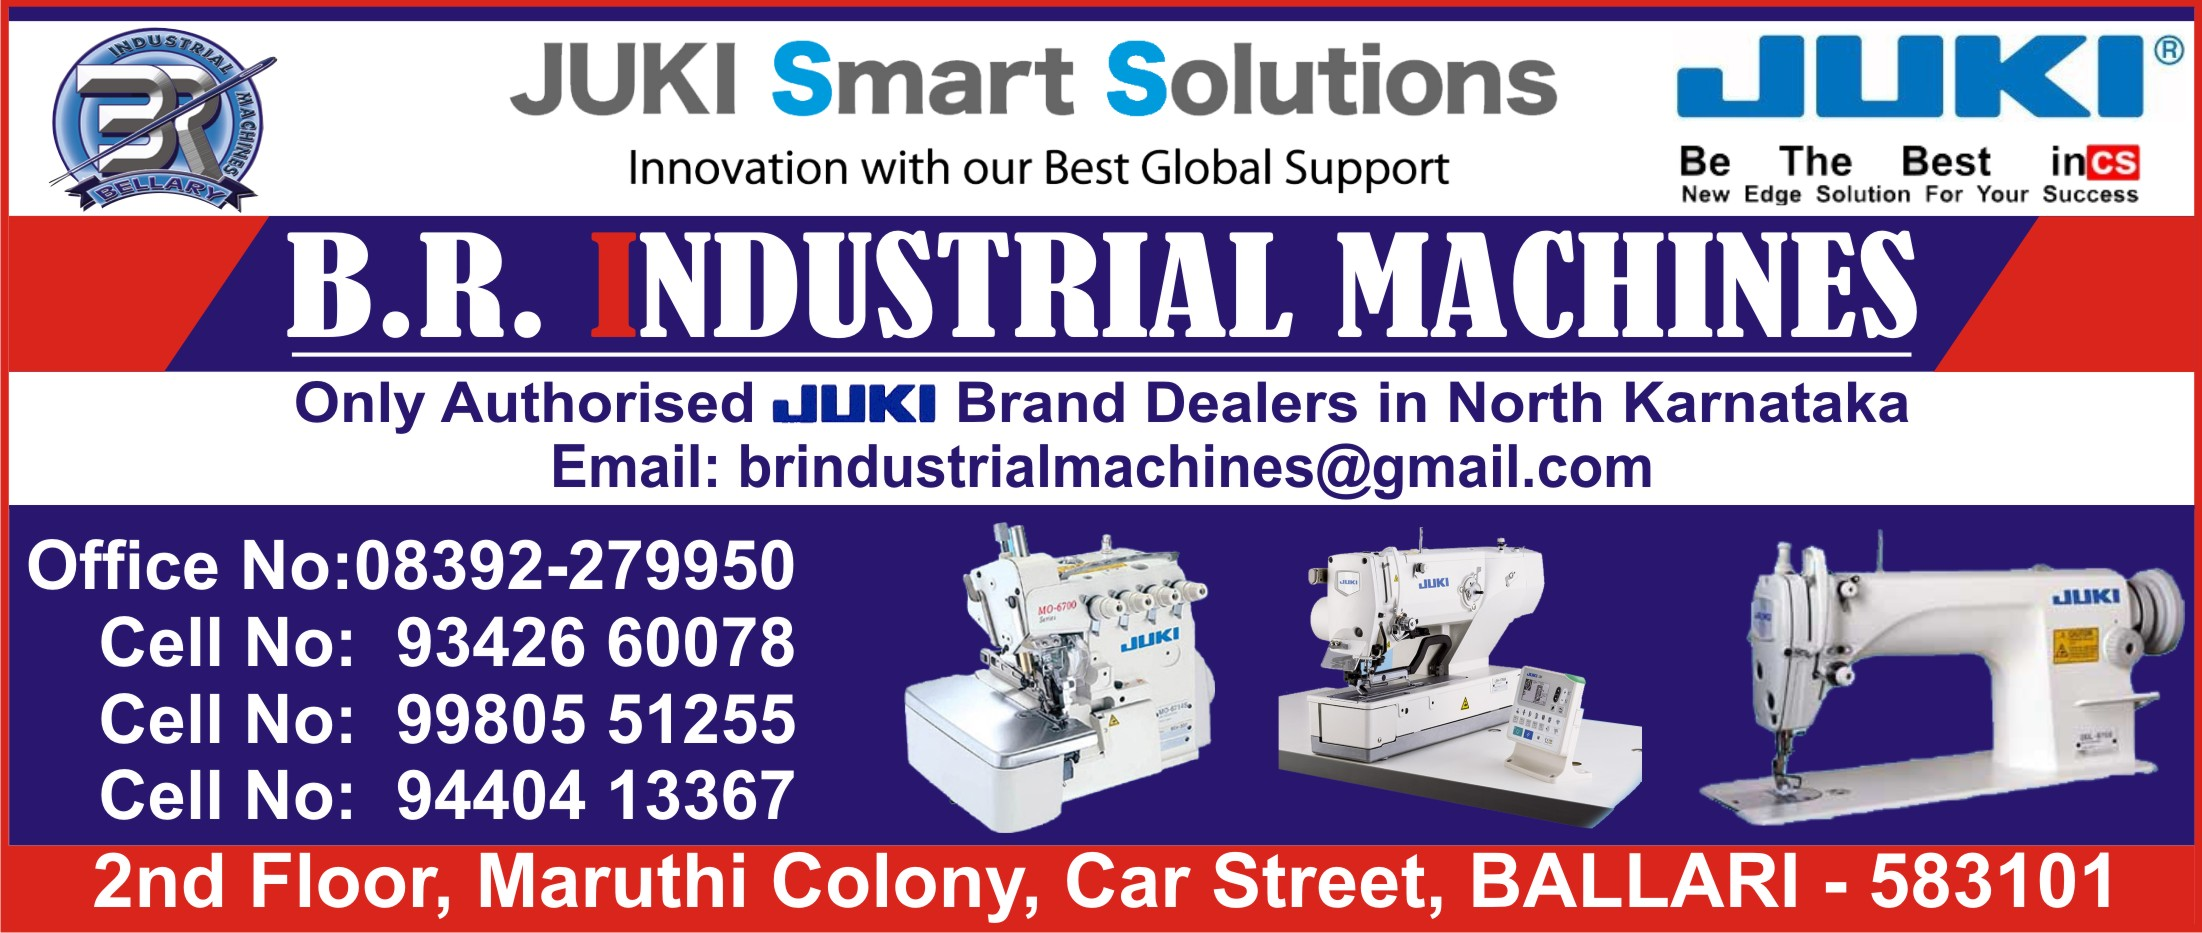 Juki Industrial Sewing Machines in Ballari